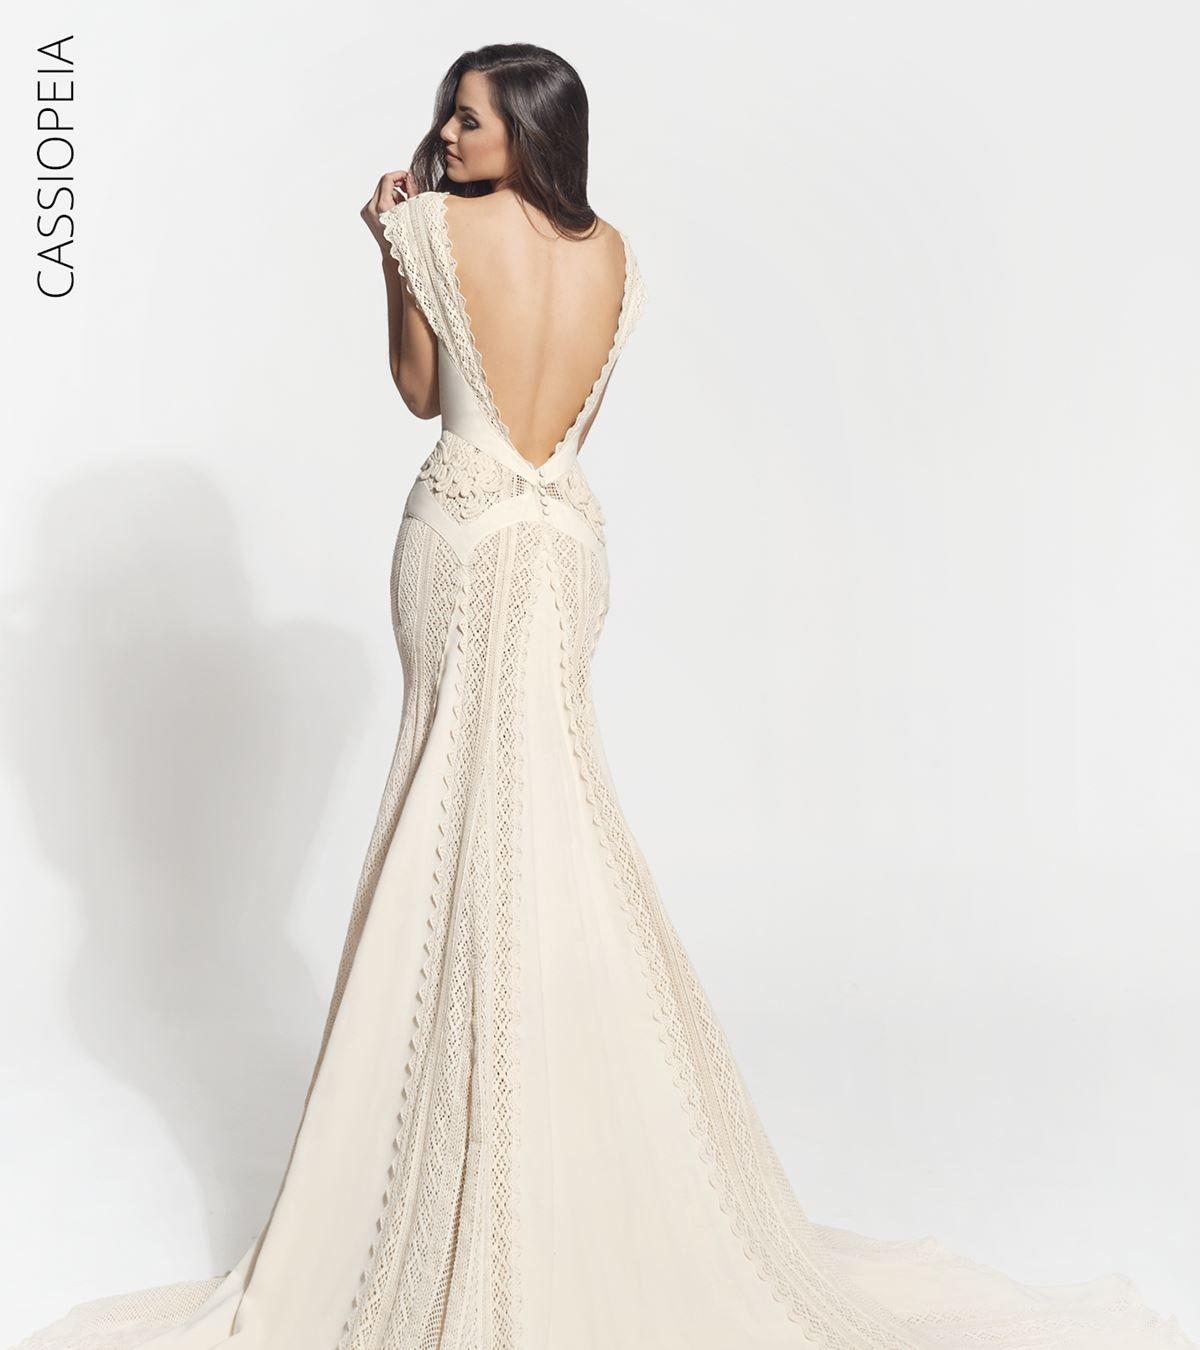 Zolotas Australia Bridal Wear | Wedding Dresses | Easy Weddings ...